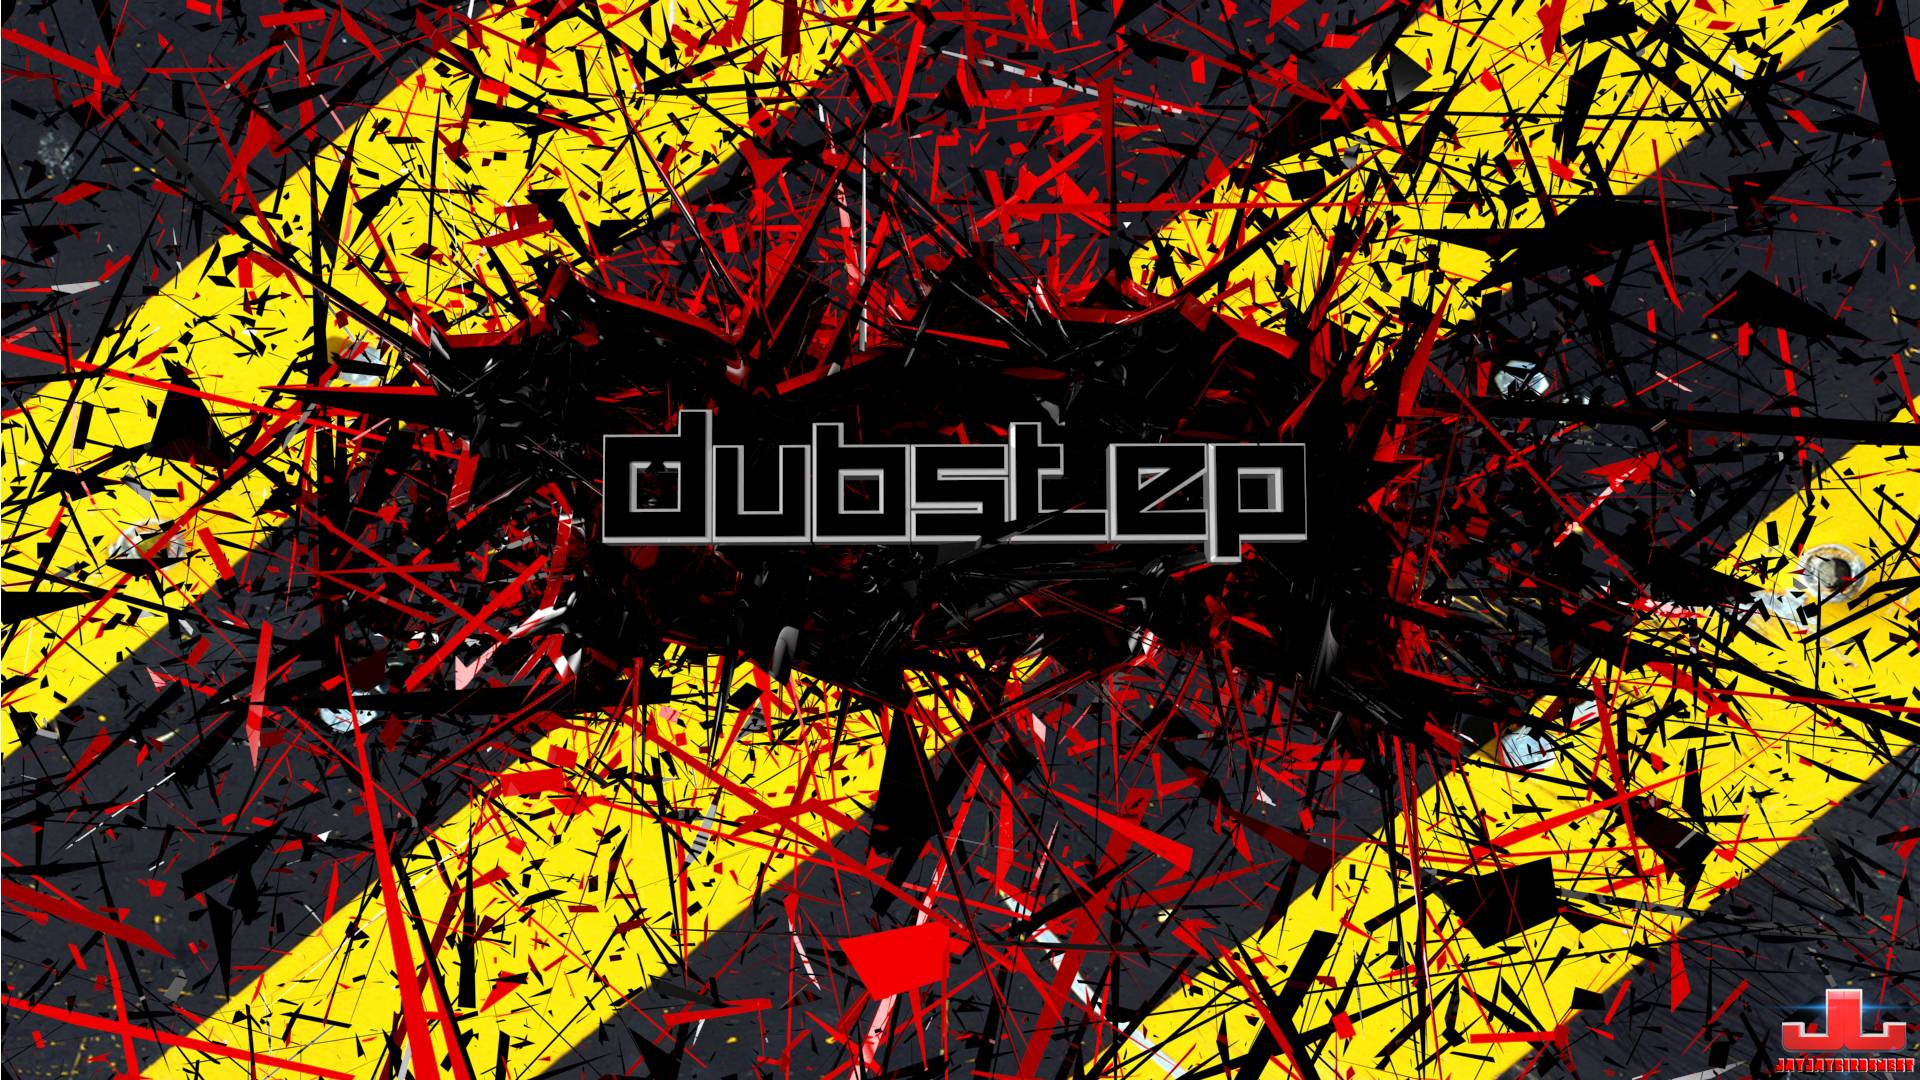 abstract dubstep wallpaper 1080p - photo #20